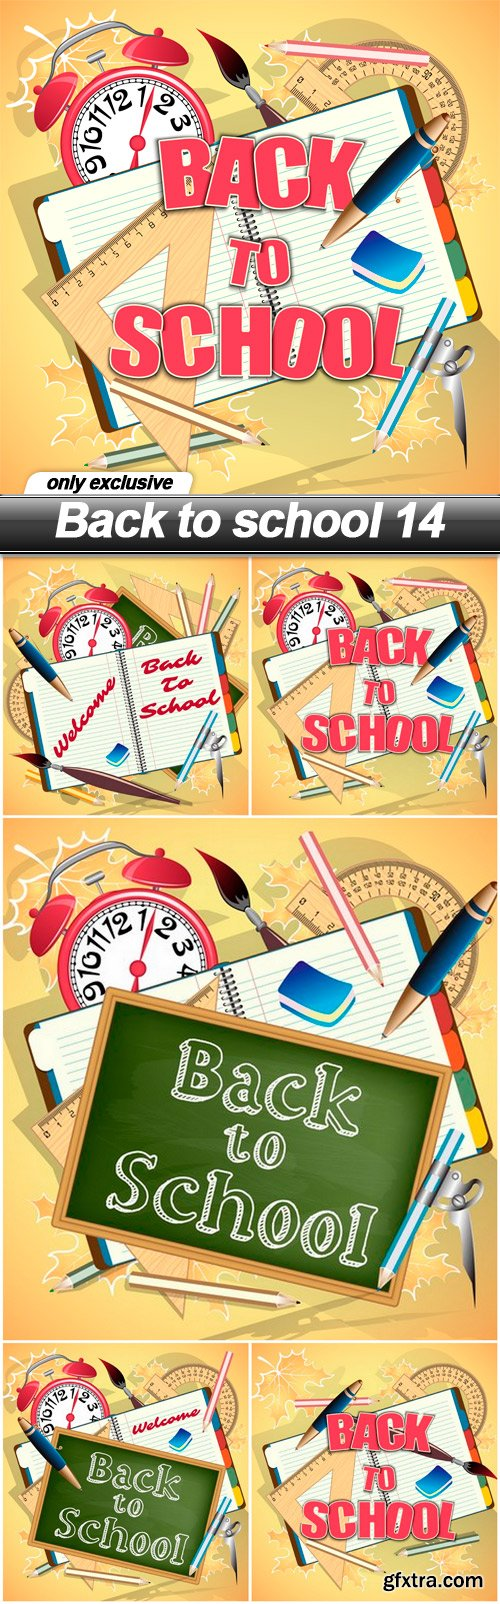 Back to school 14 - 5 EPS